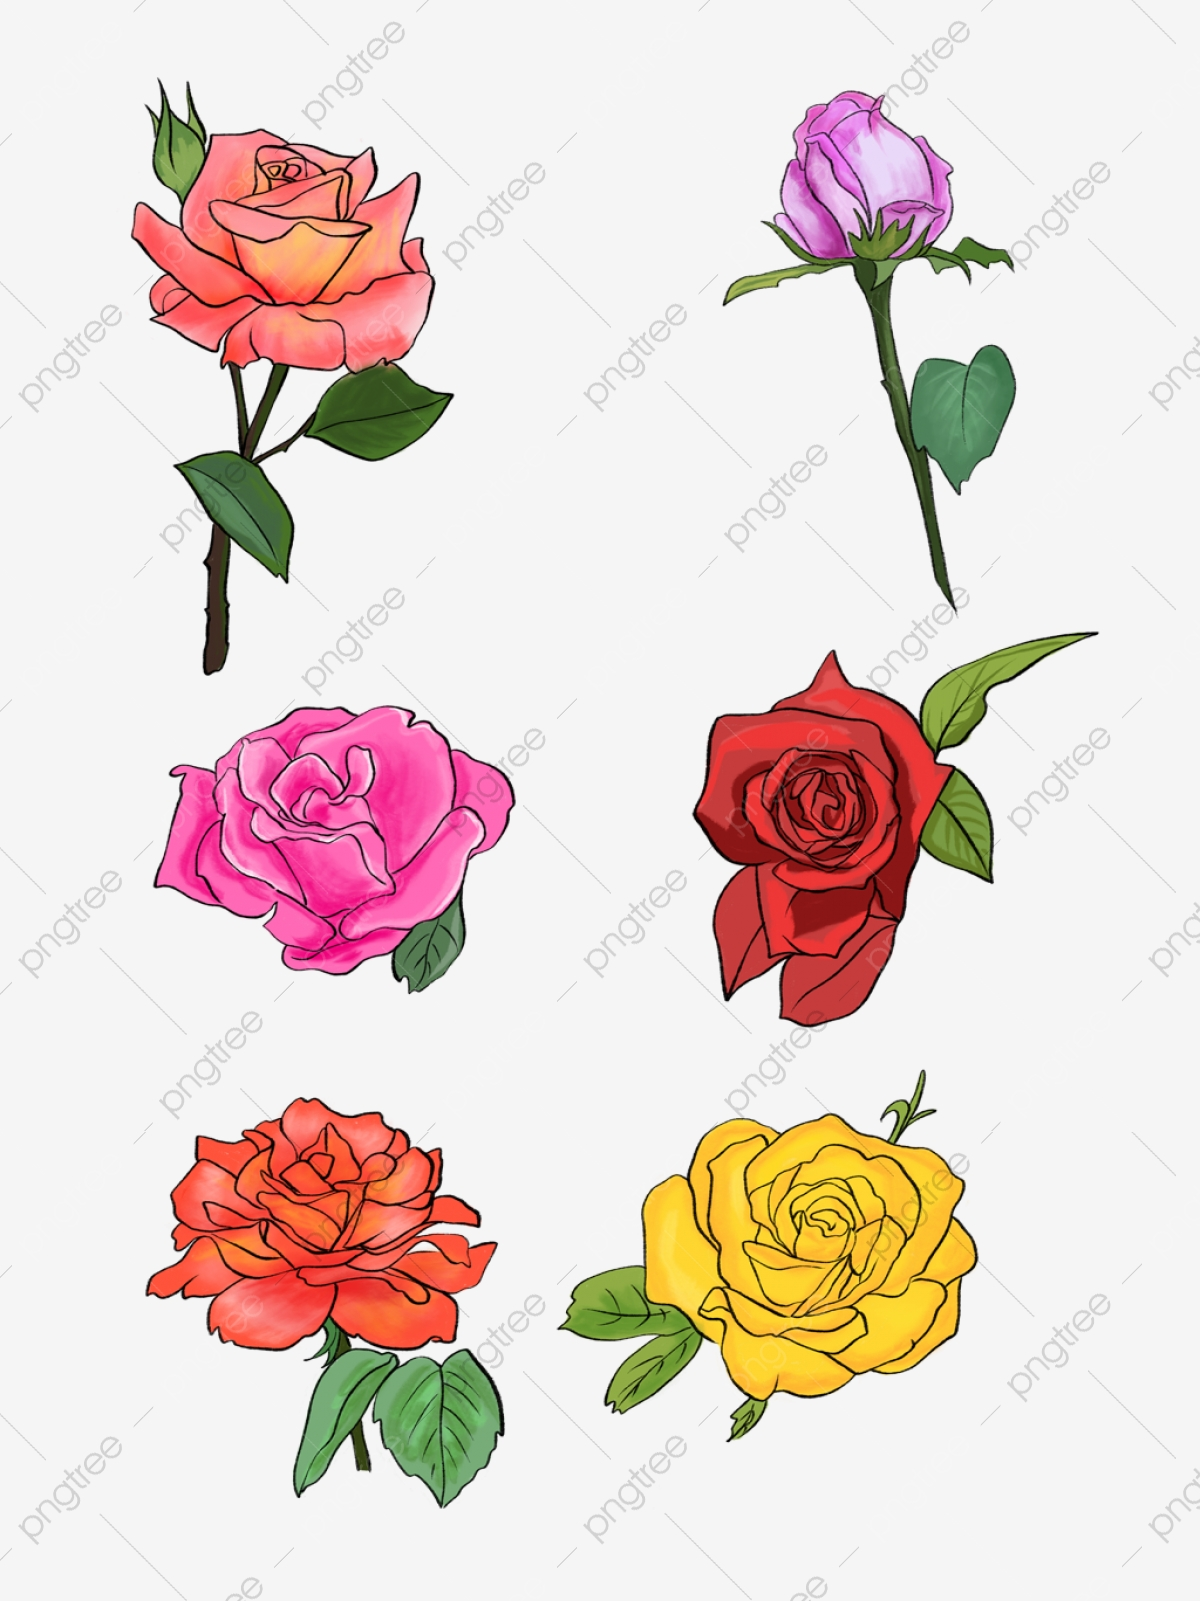 Reka Bentuk Corak Hiasan Bunga Mawar